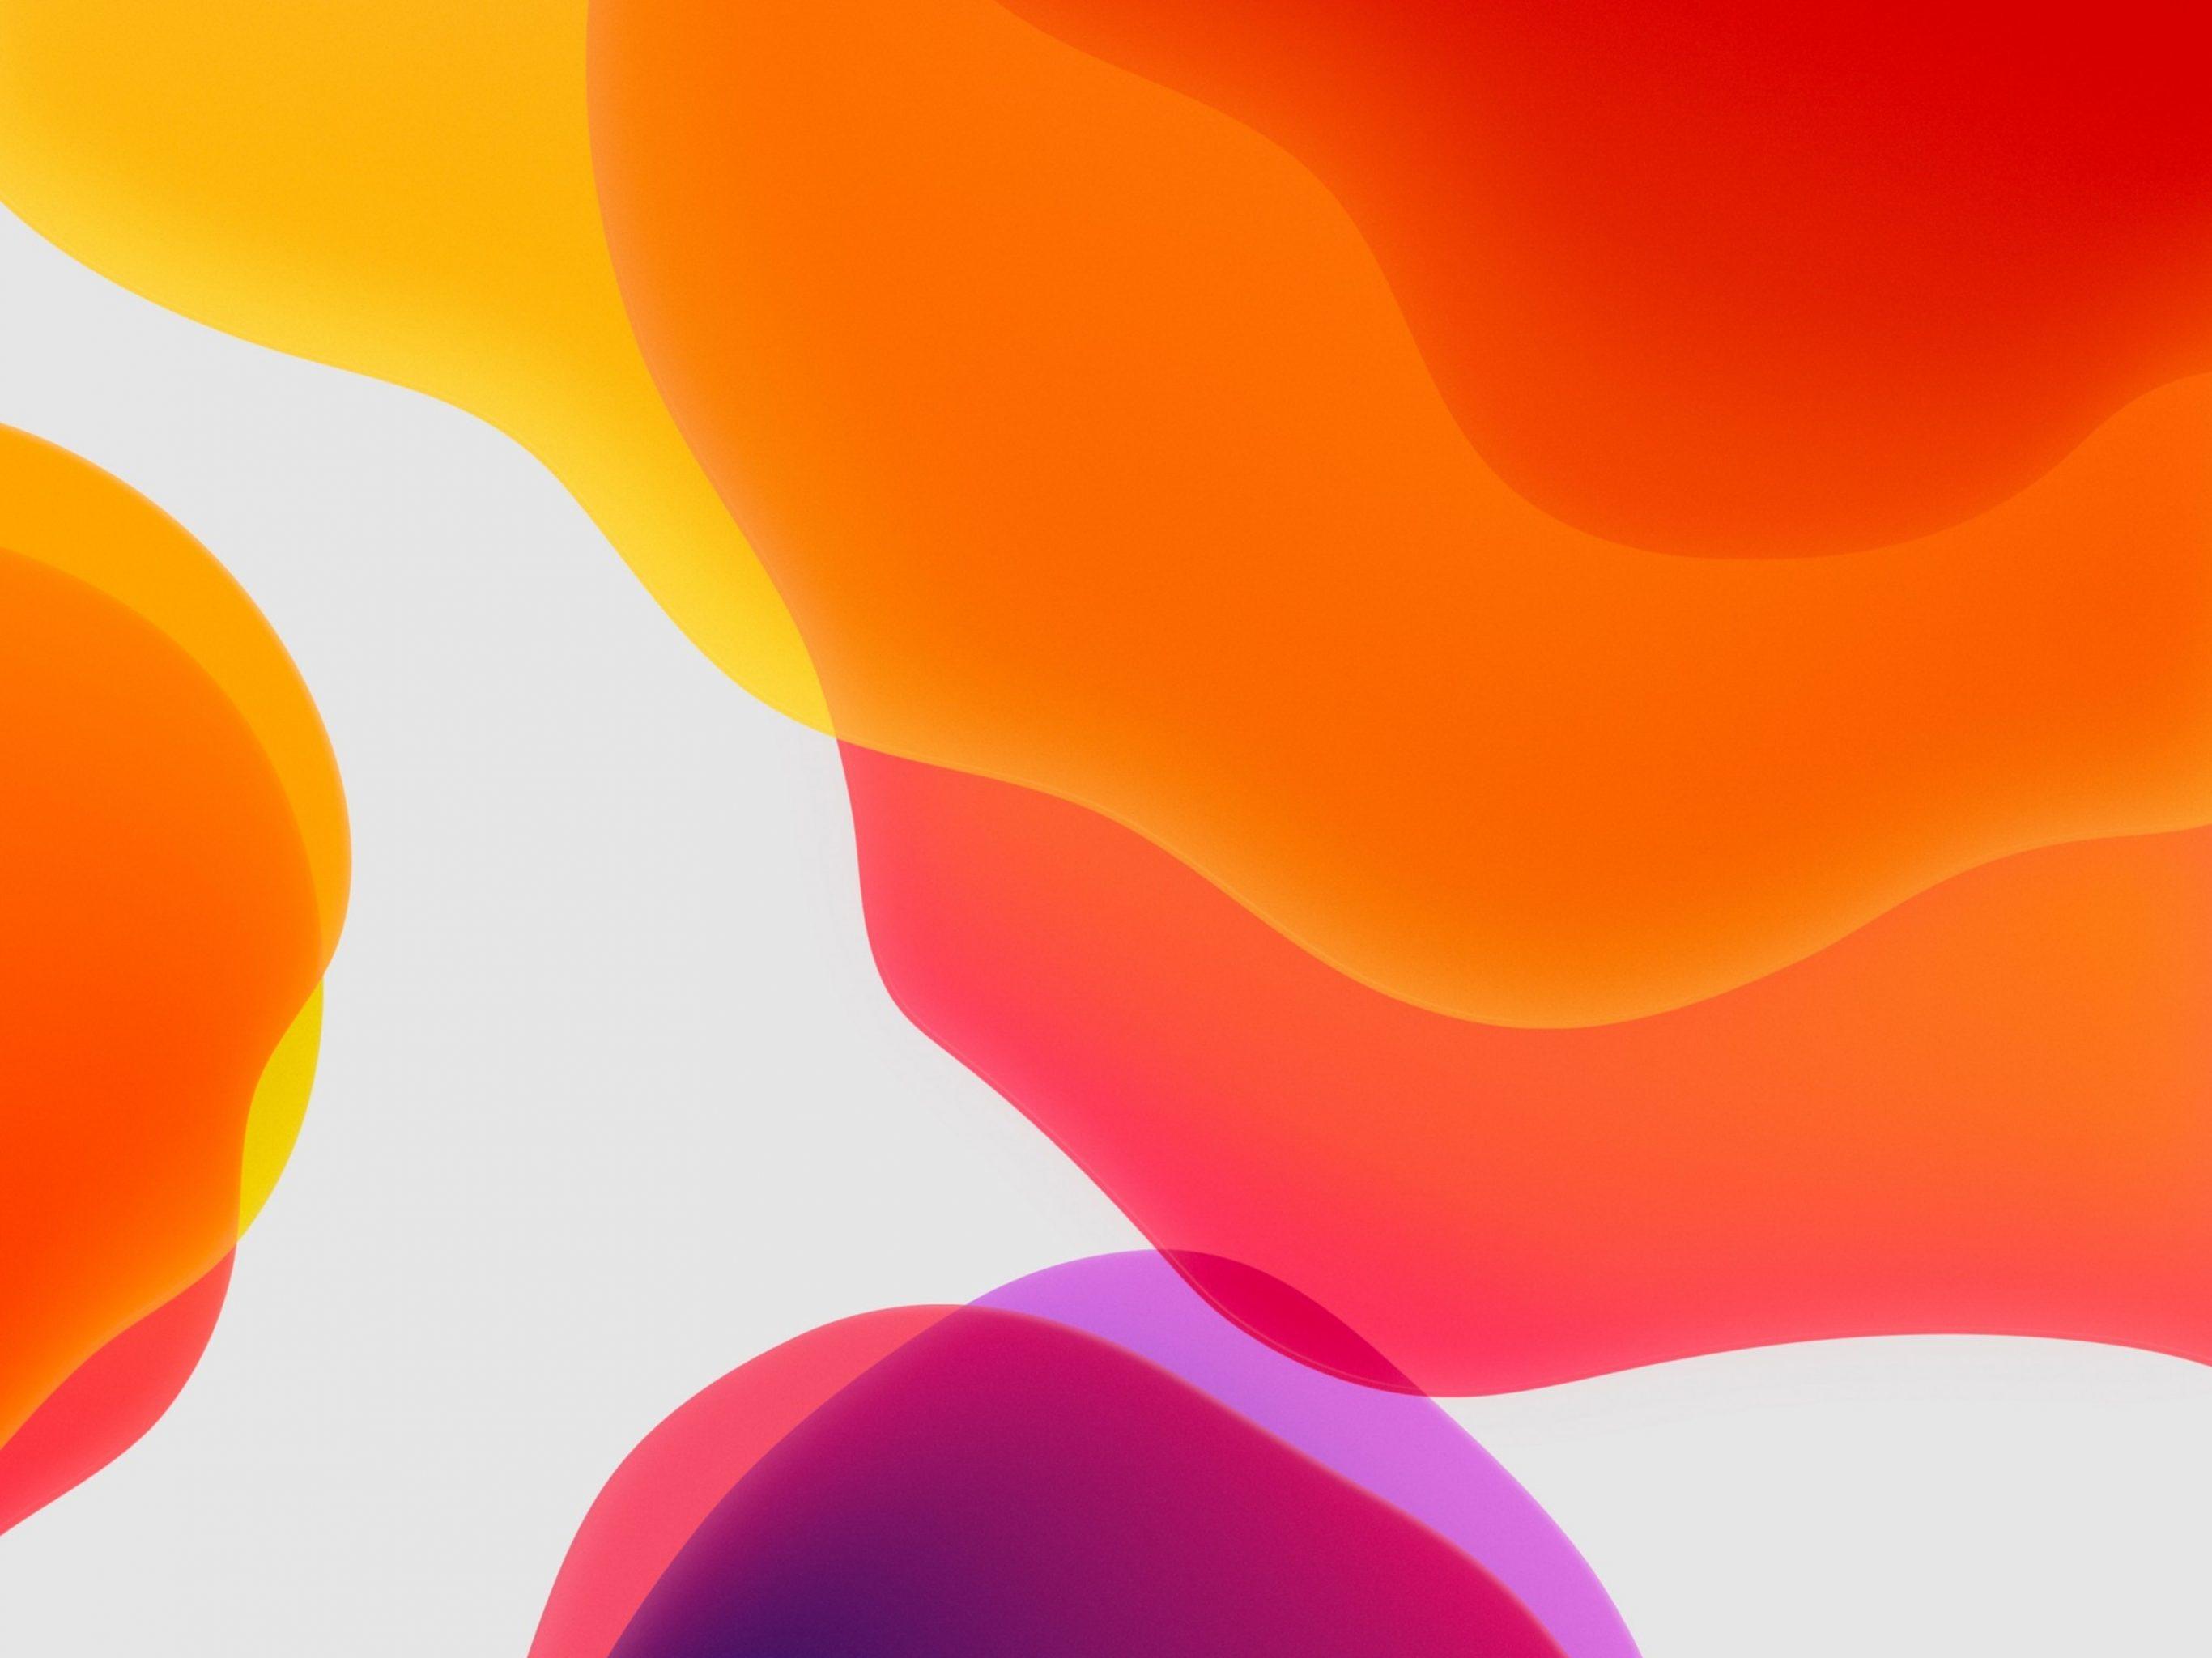 2732x2048 iPad air iPad Pro wallpapers Orange Ipados Ipad Wallpaper 2732x2048 pixels resolution